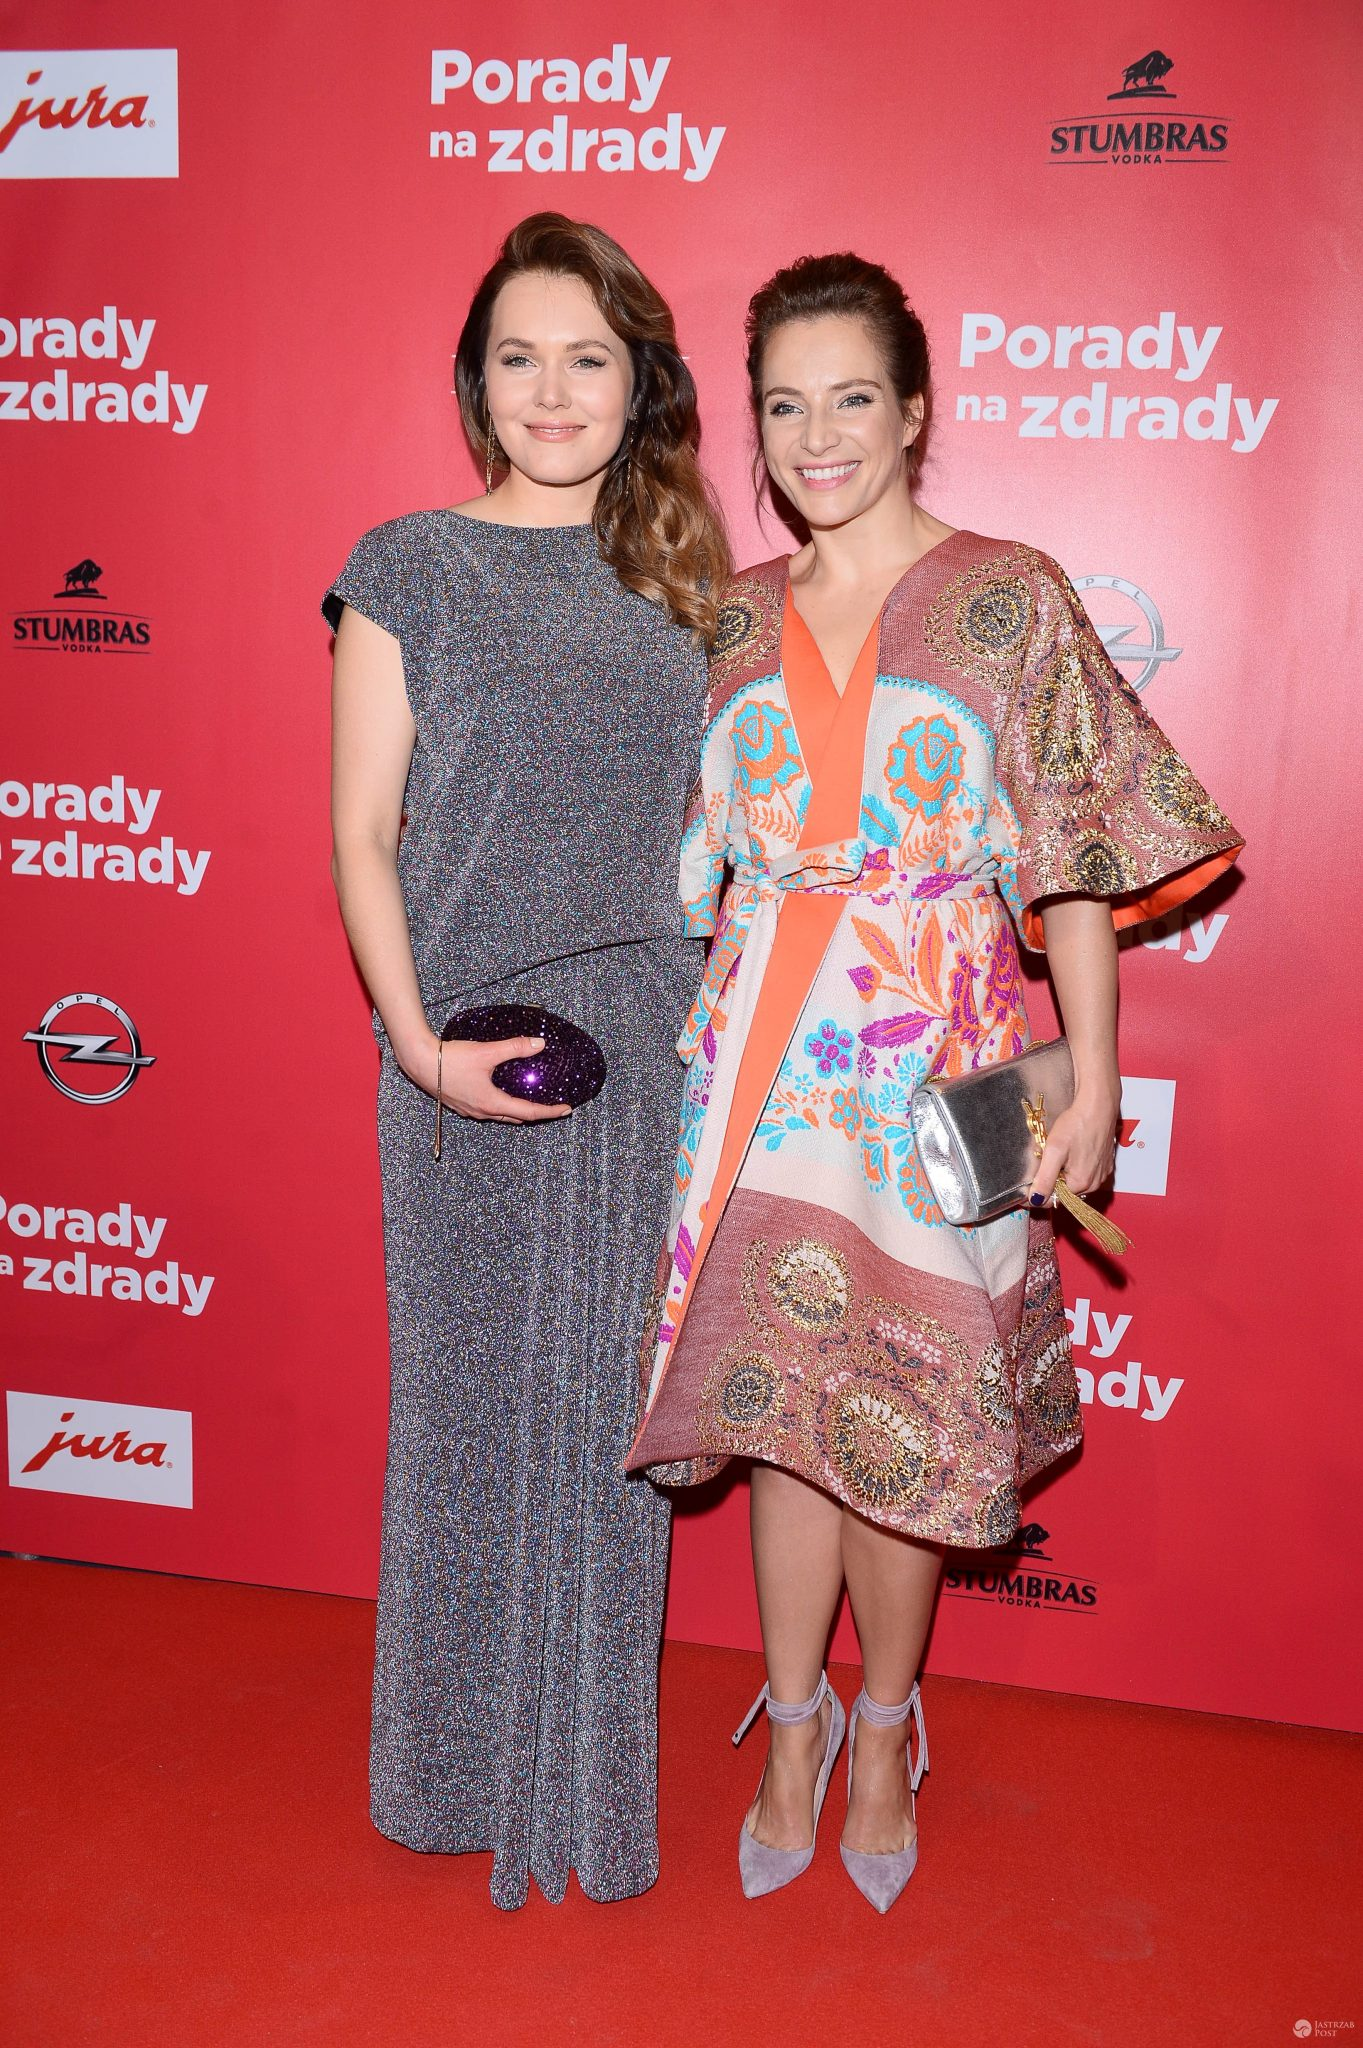 Magdalena Lamparska i Anna Dereszowska - premiera Porady na zdrady